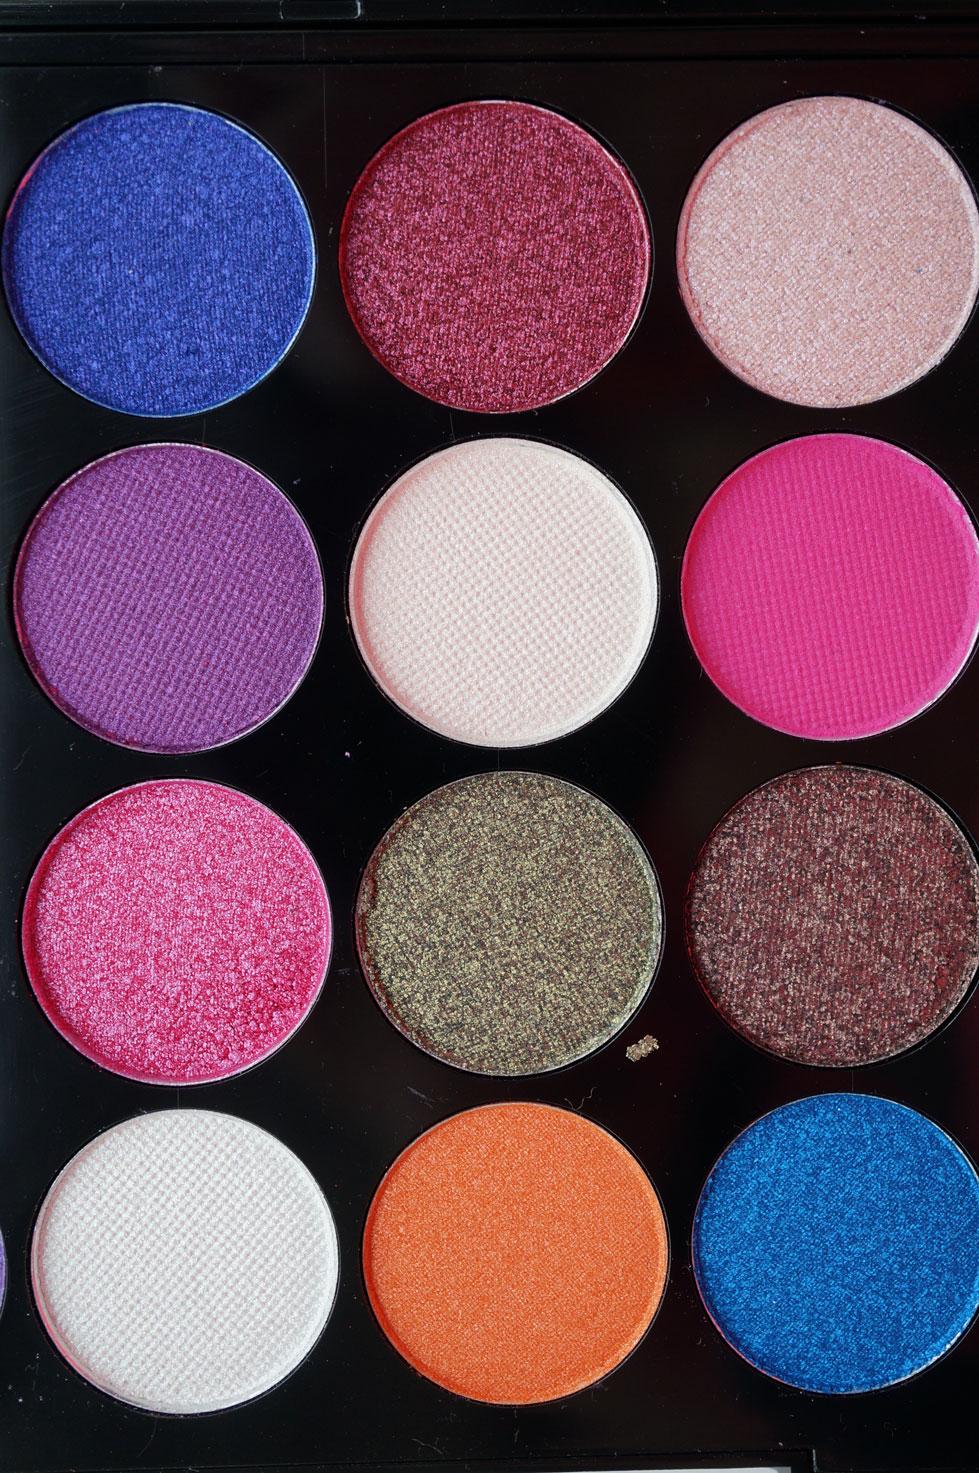 NEW Makeup Revolution Ultra Eyes Like Angels Eyeshadow Palette | Review - Thou Shalt Not Covet...